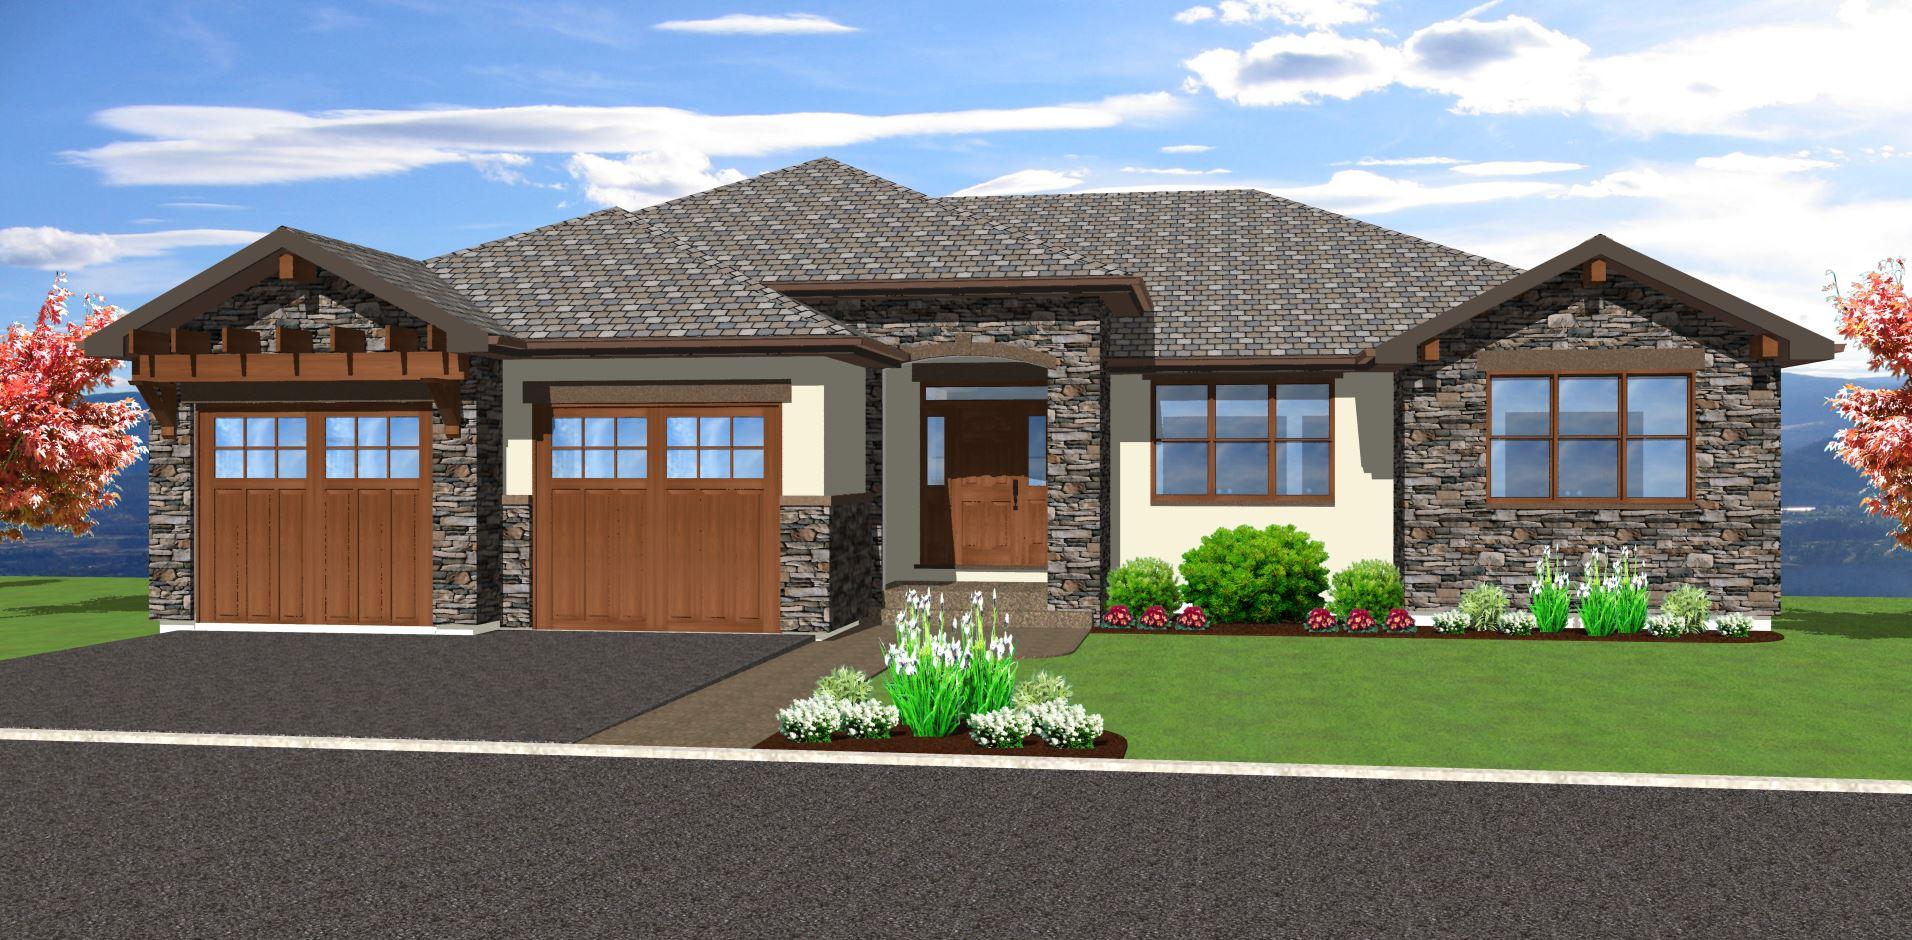 Spacious Hillside Home With Walkout Basement - 67702MG ...